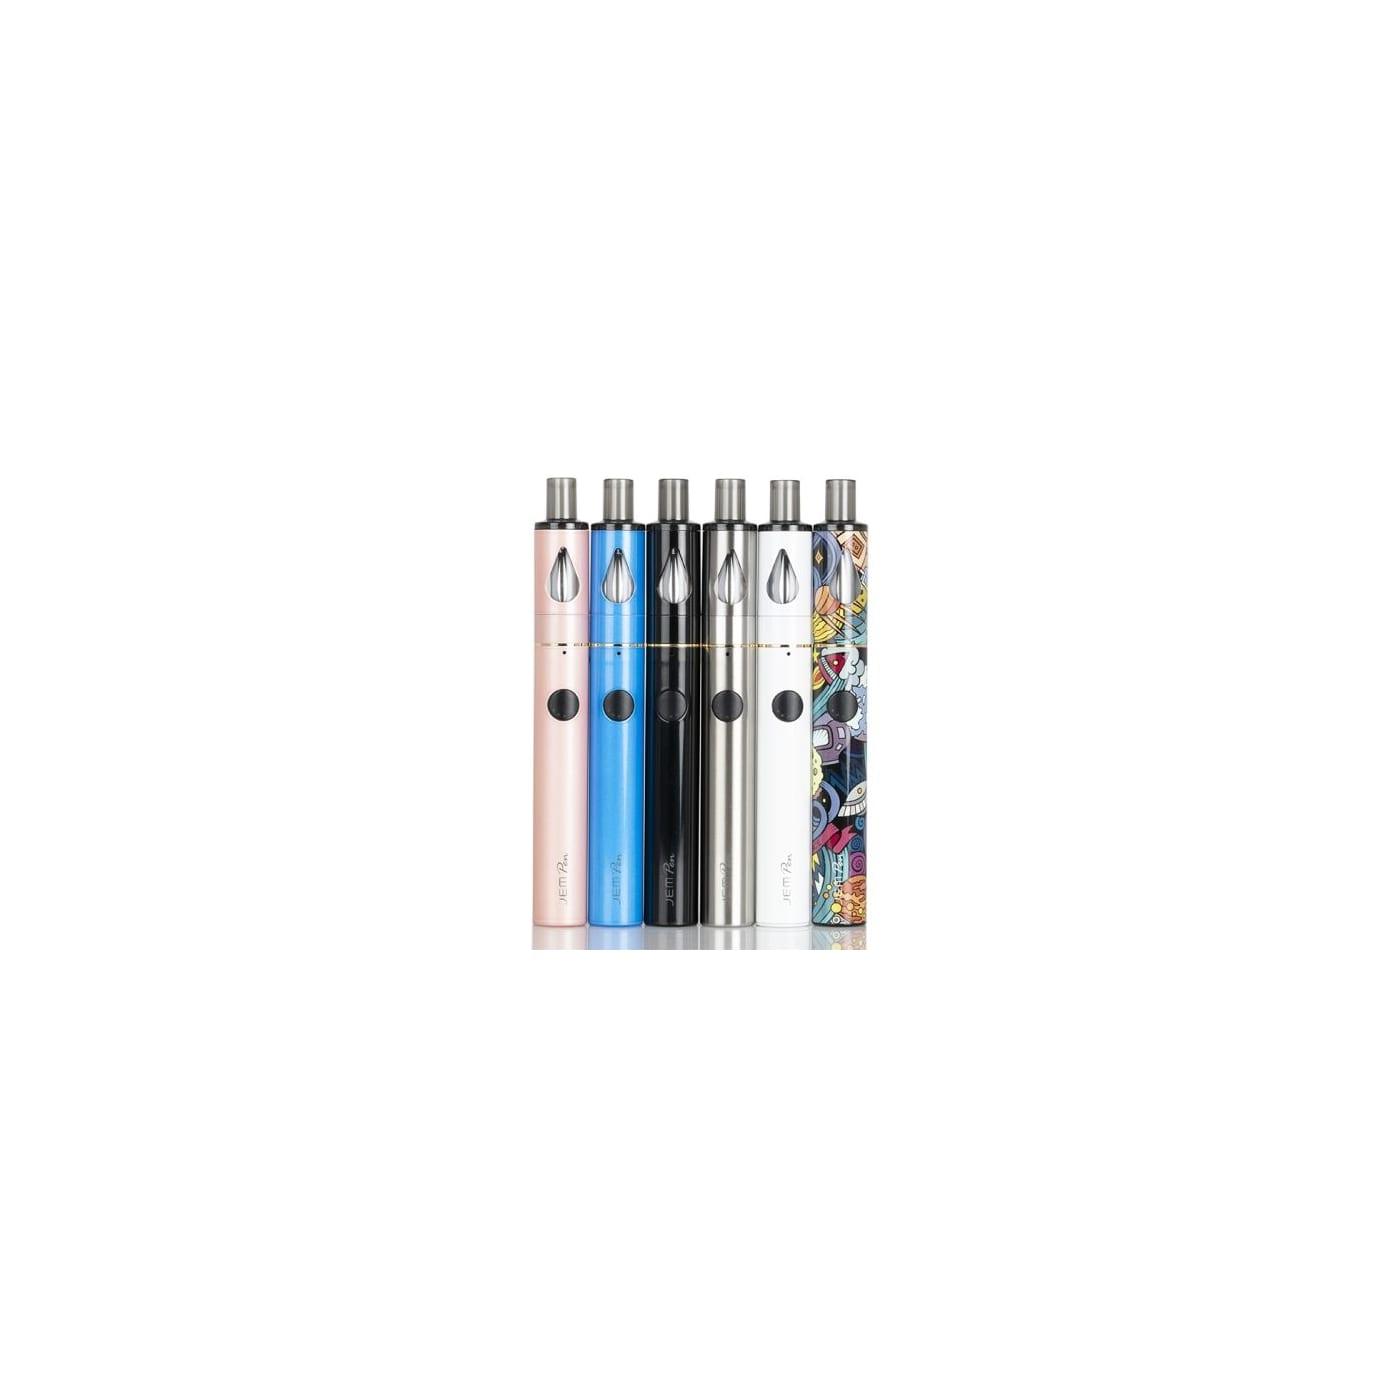 Innokin Jem Pen Kit